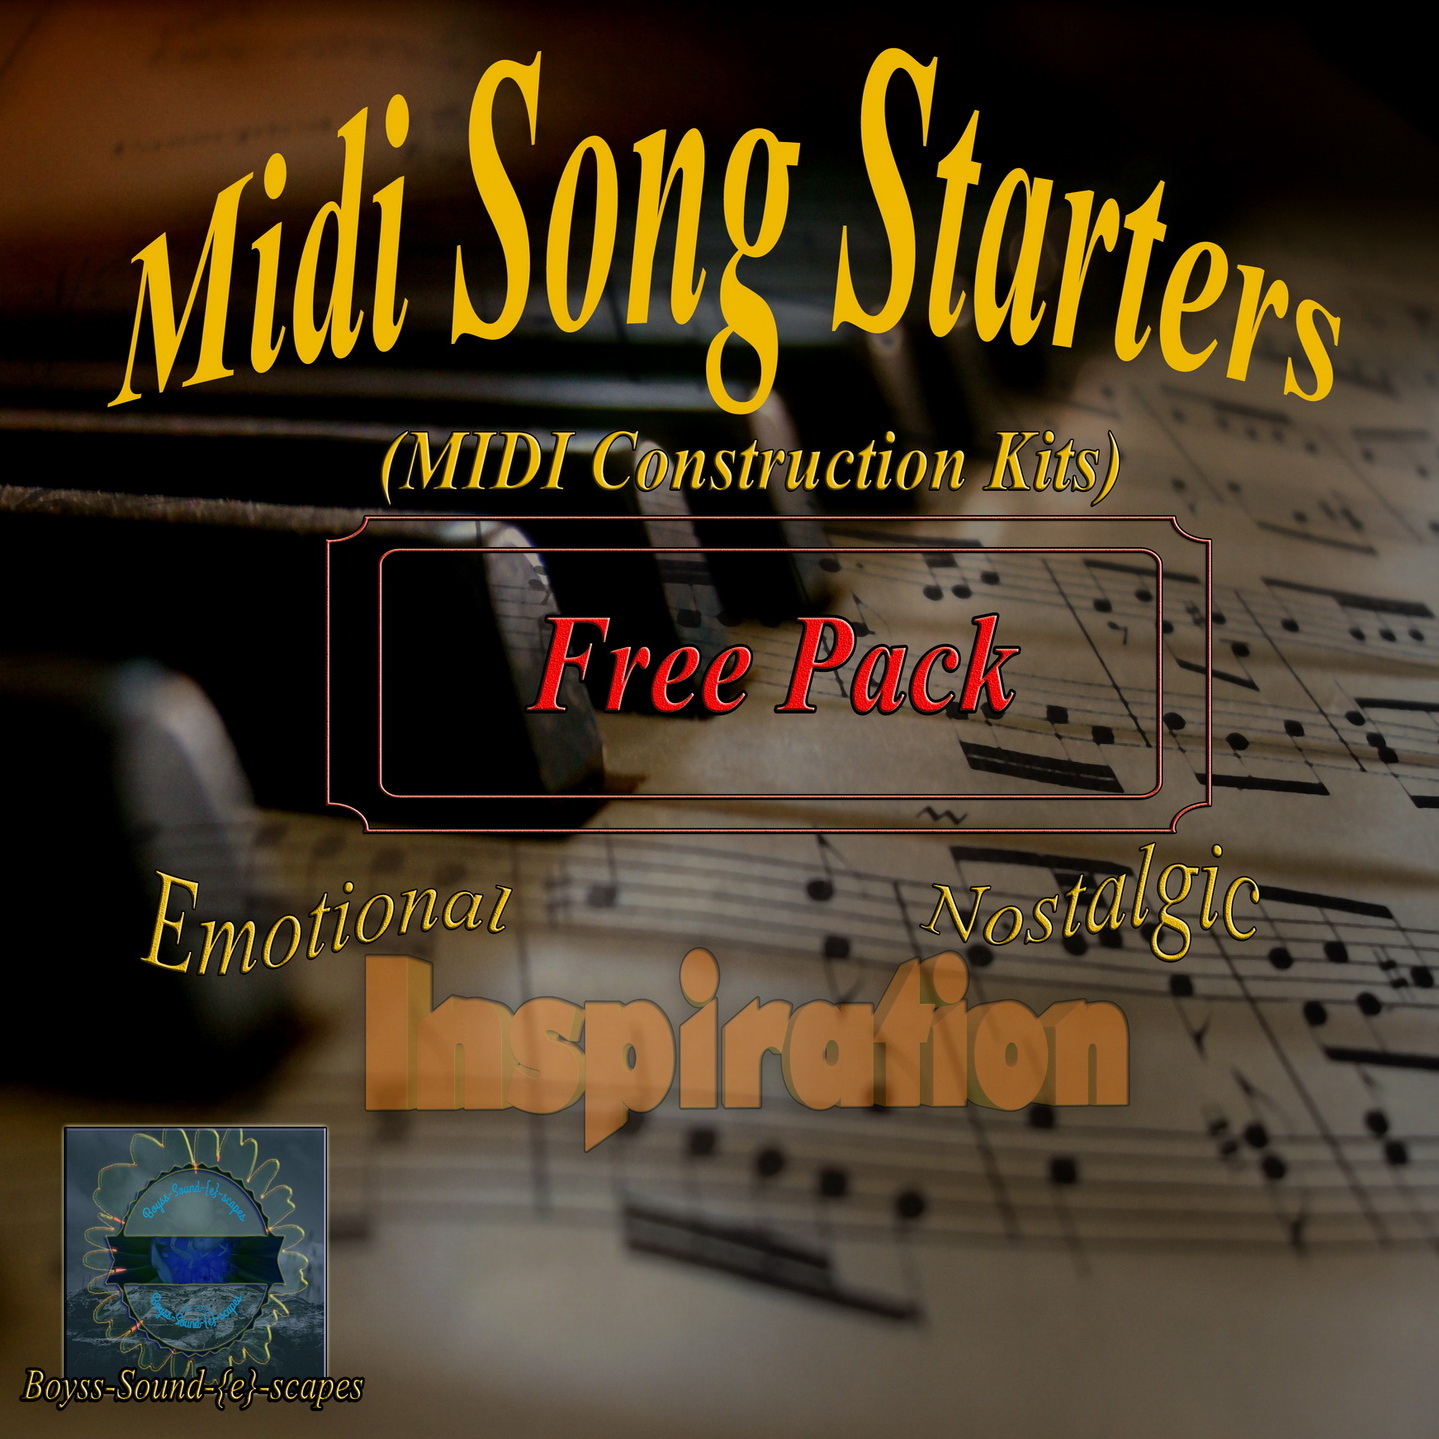 KVR: Midi Song Starters free Edition (MIDI Construction Kit